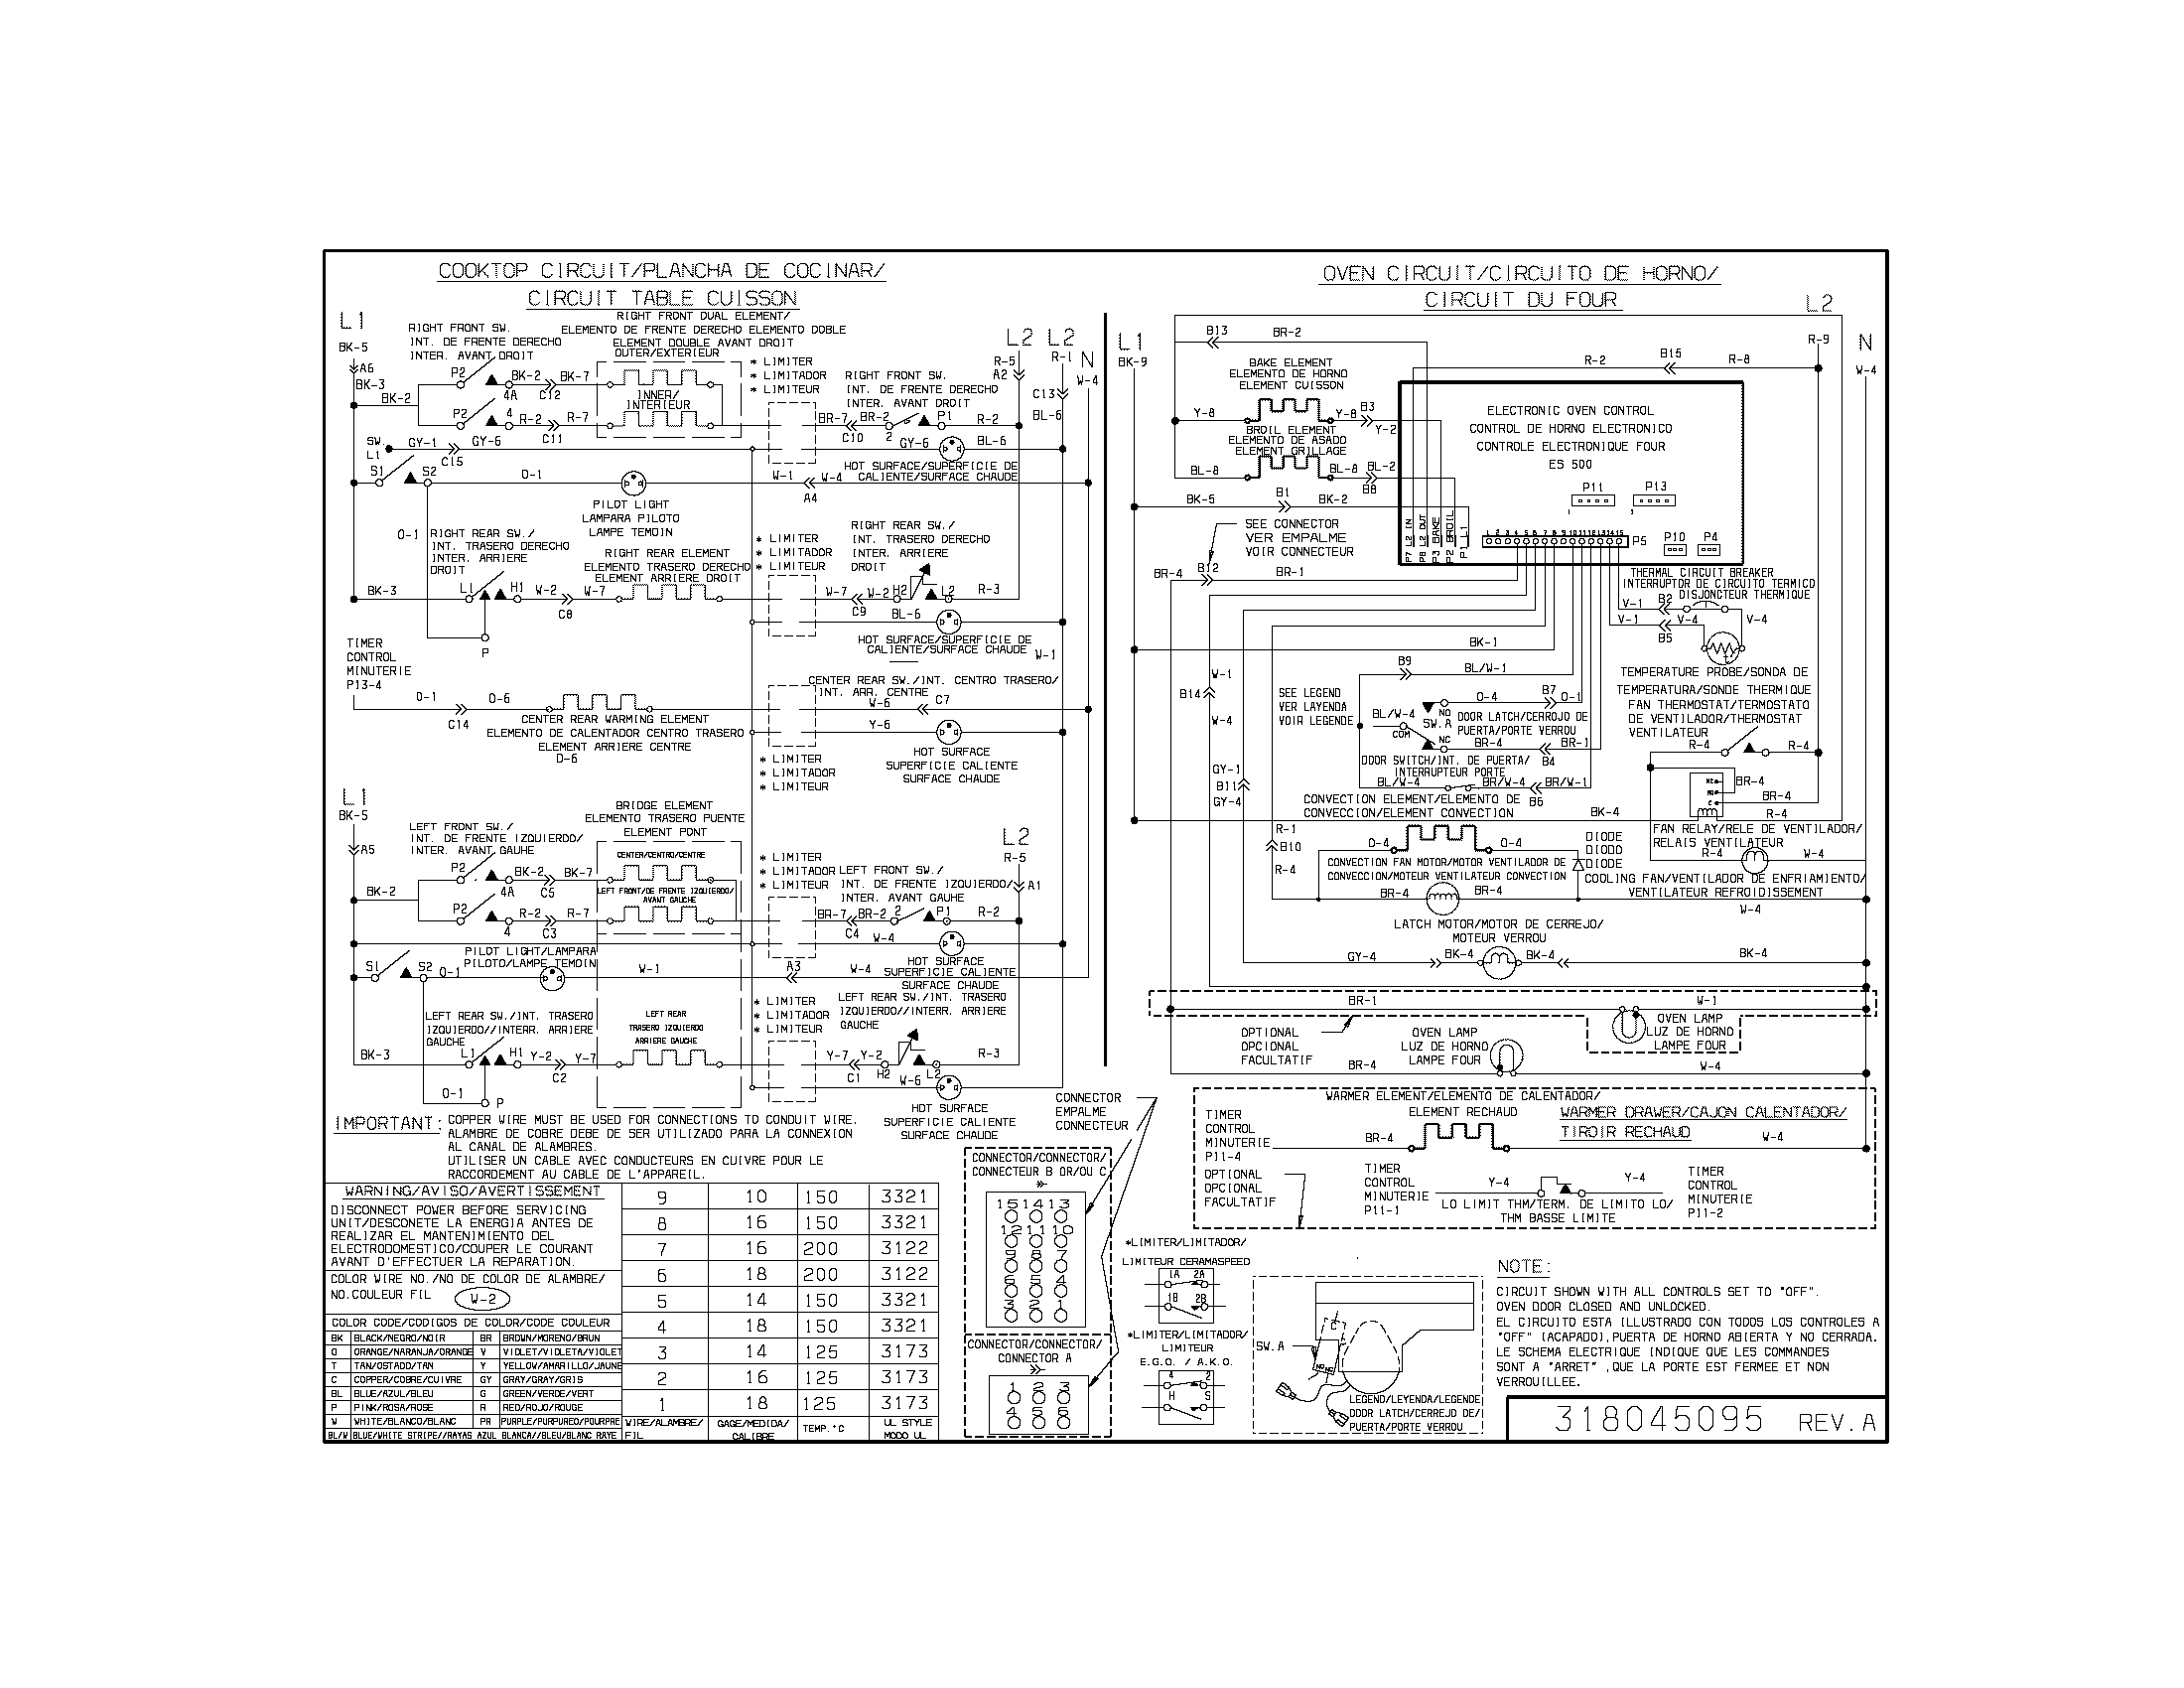 wiring diagram parts?resize\=665%2C514\&ssl\=1 e g o simmerstat wiring diagram simmerstat connections \u2022 45 63 74 91 NSA 1200 Air Filter at panicattacktreatment.co